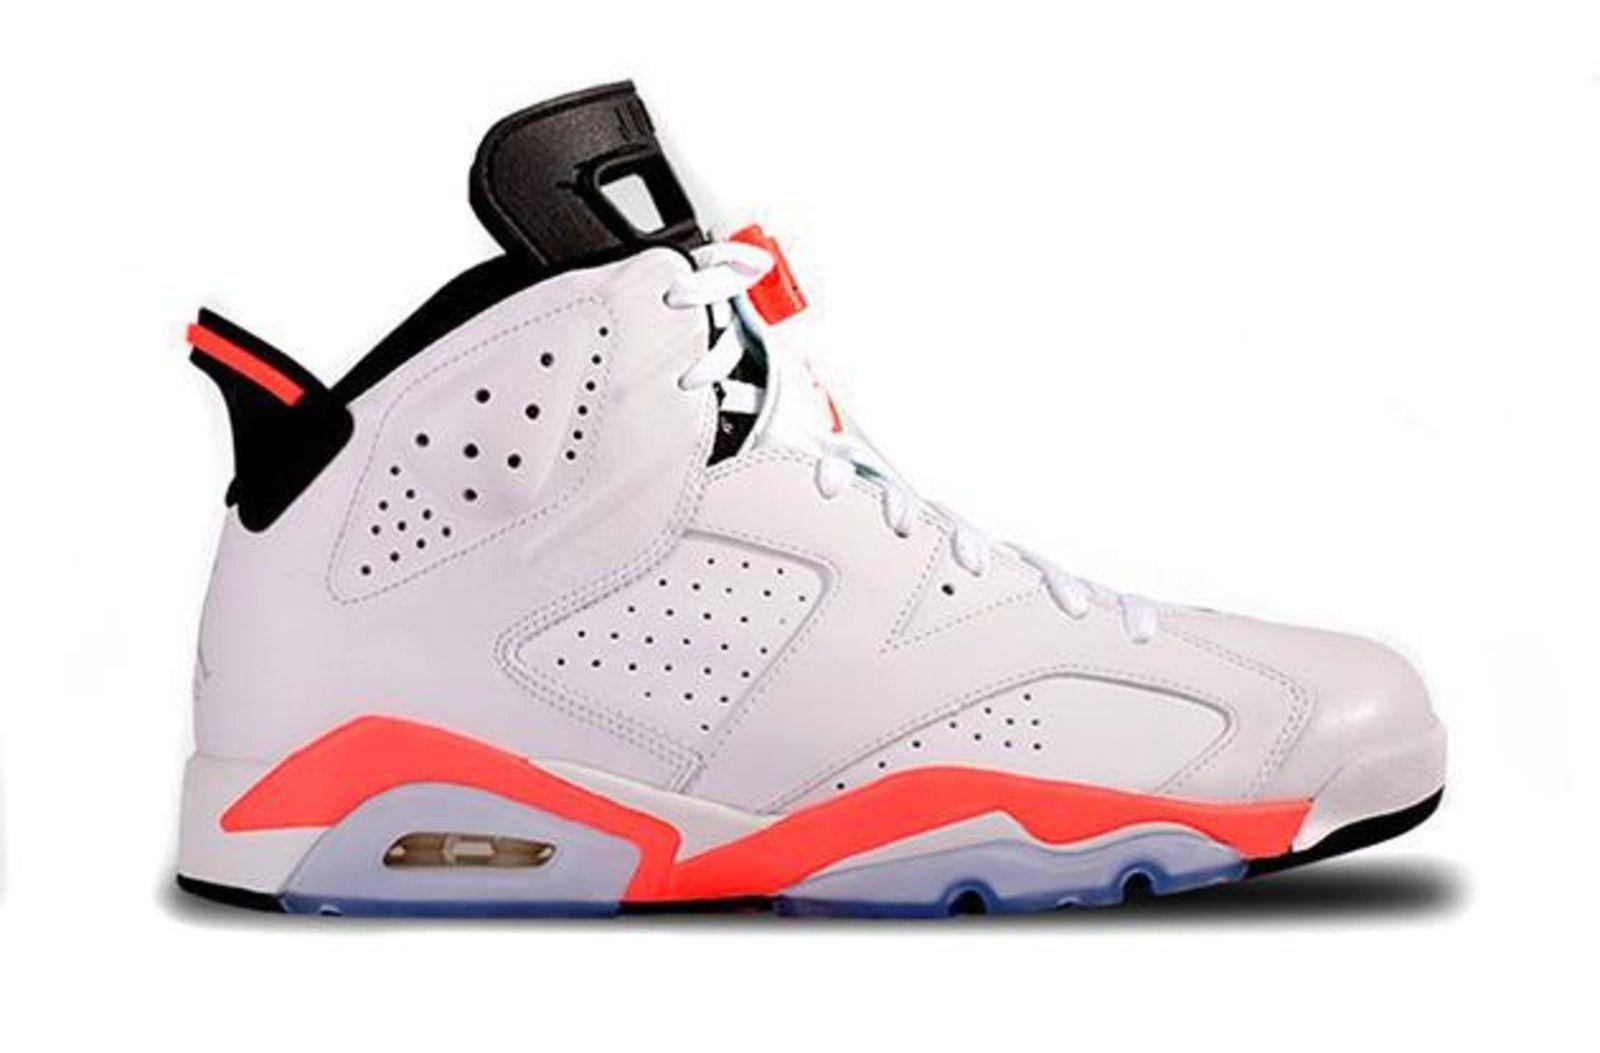 bas prix 77e9b 75905 The 25 Best-Selling Air Jordans | BEST SELLING JORDANS ...